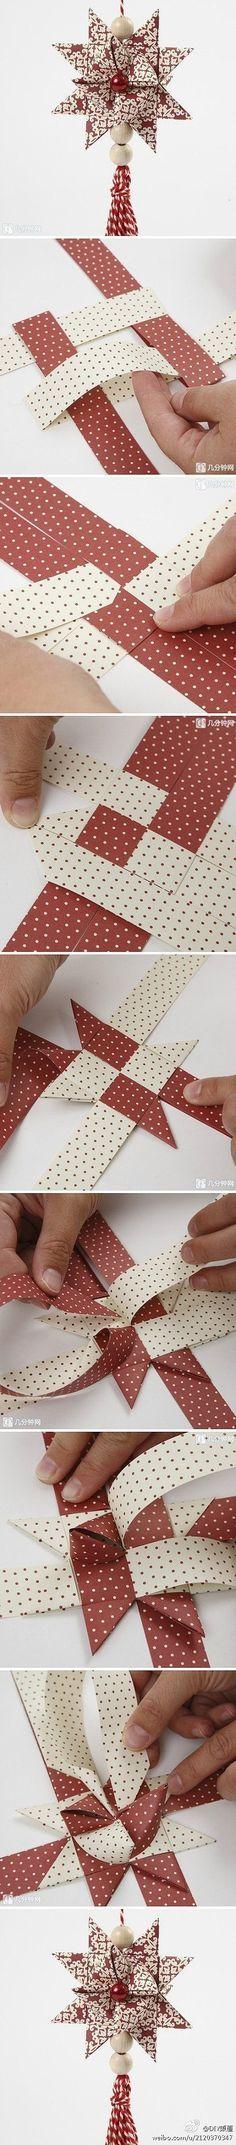 paper star folded....